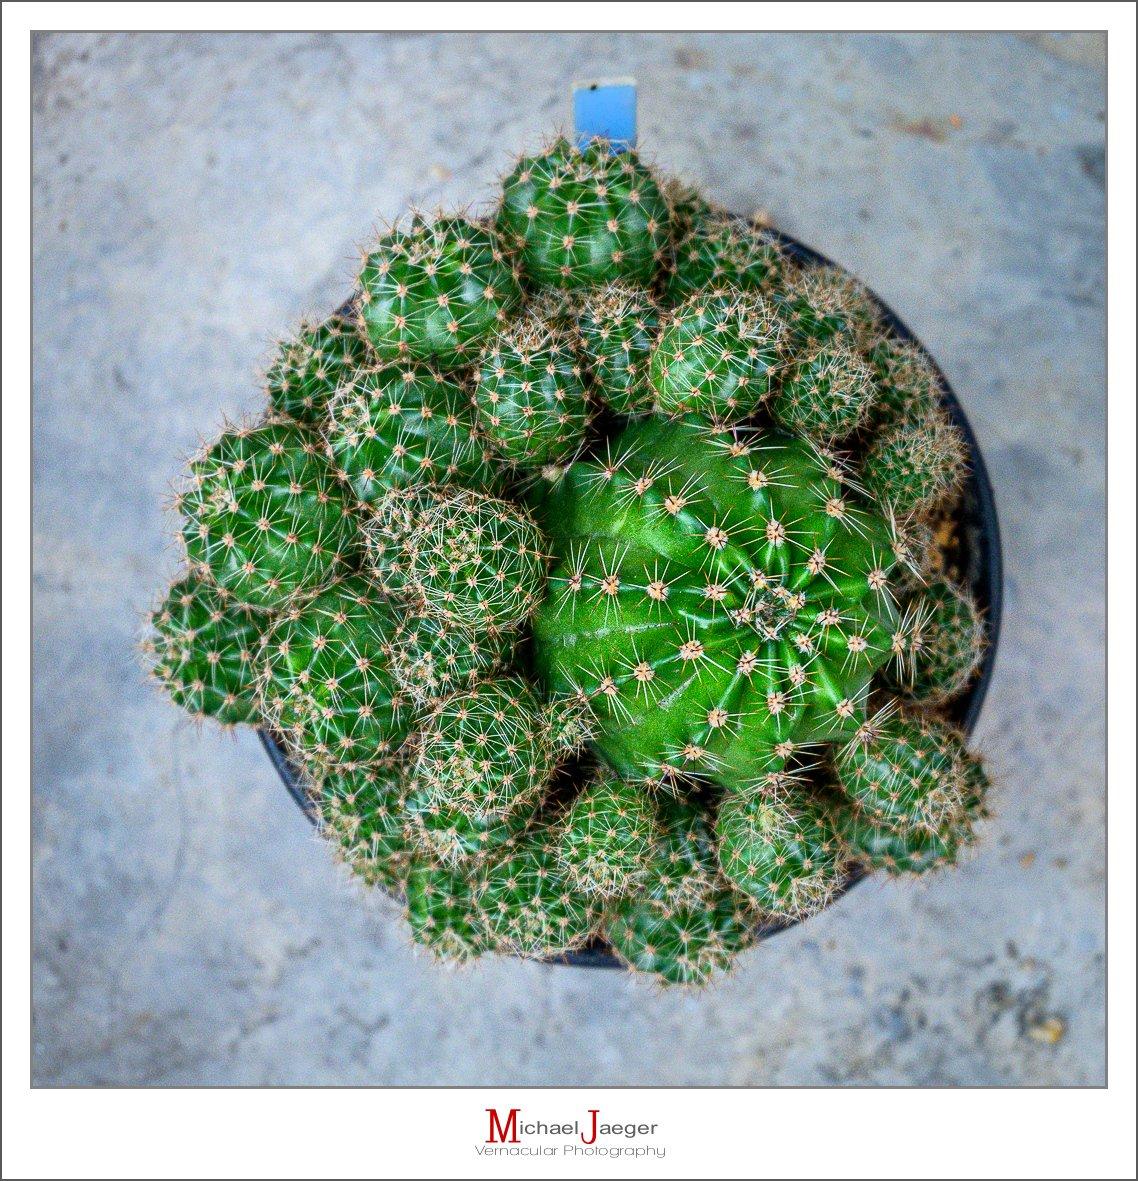 green cactus-1-3.jpg